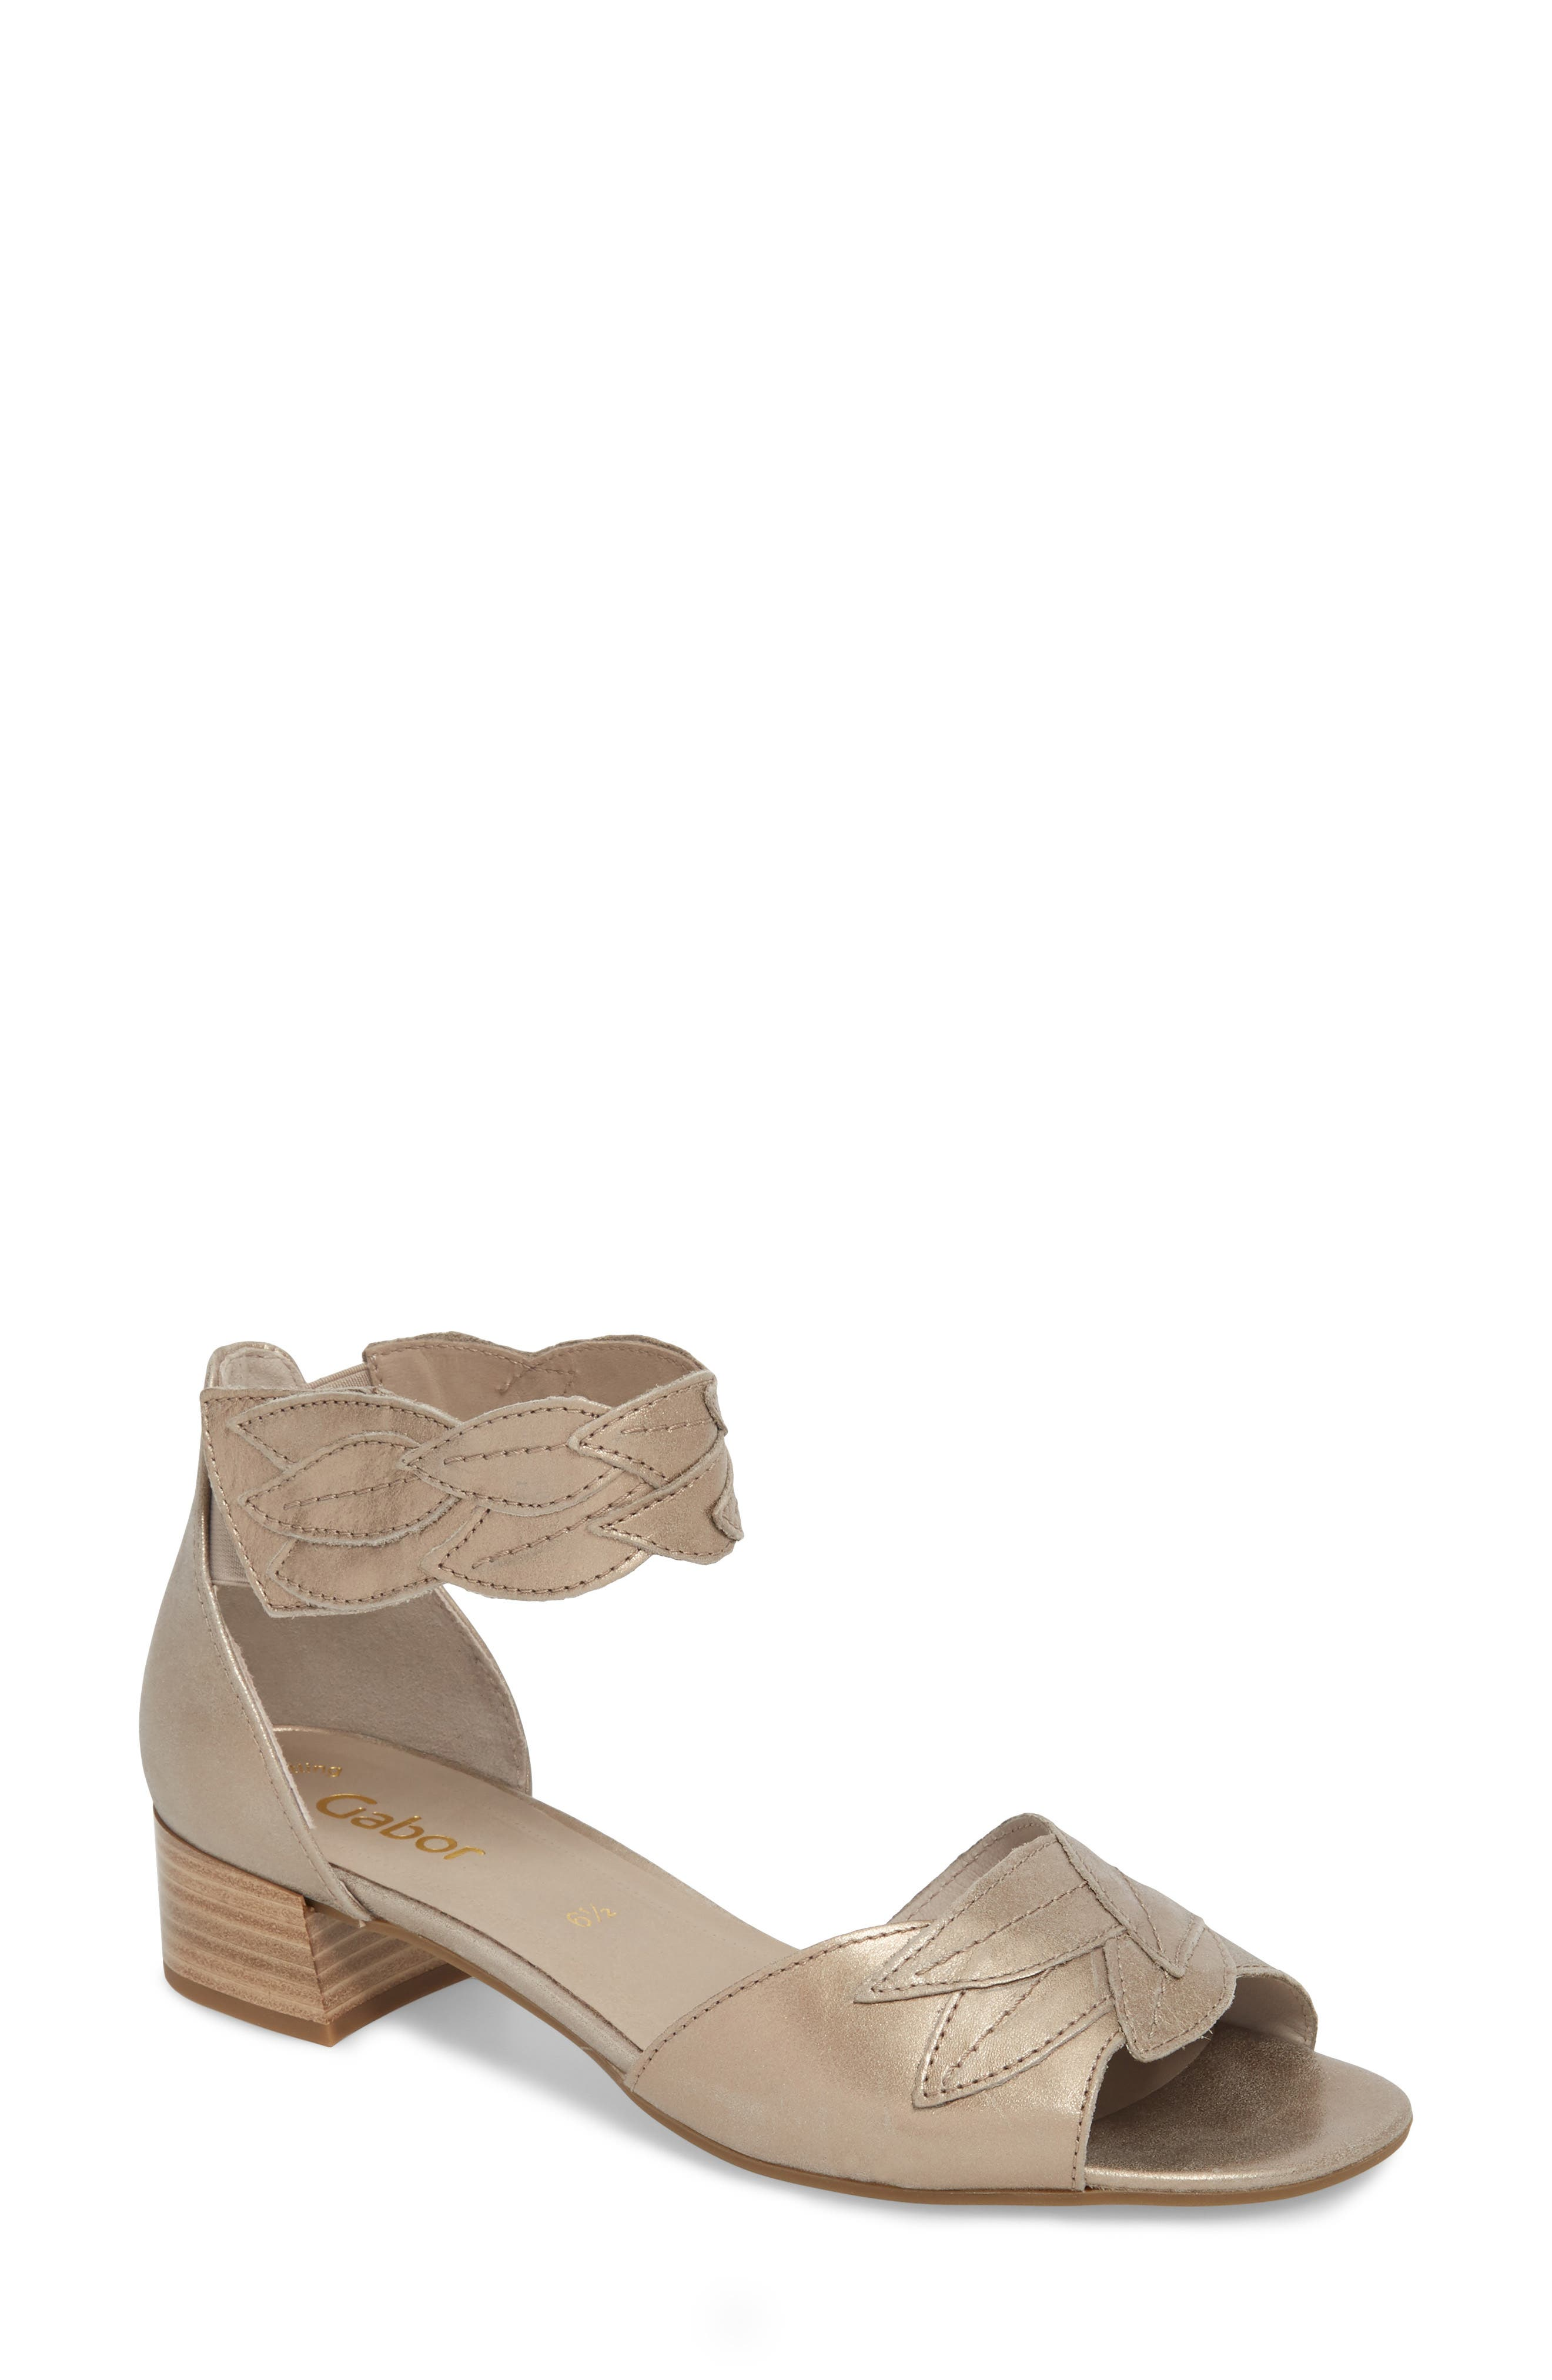 Leaf Ankle Strap Sandal,                         Main,                         color, BEIGE METALLIC LEATHER